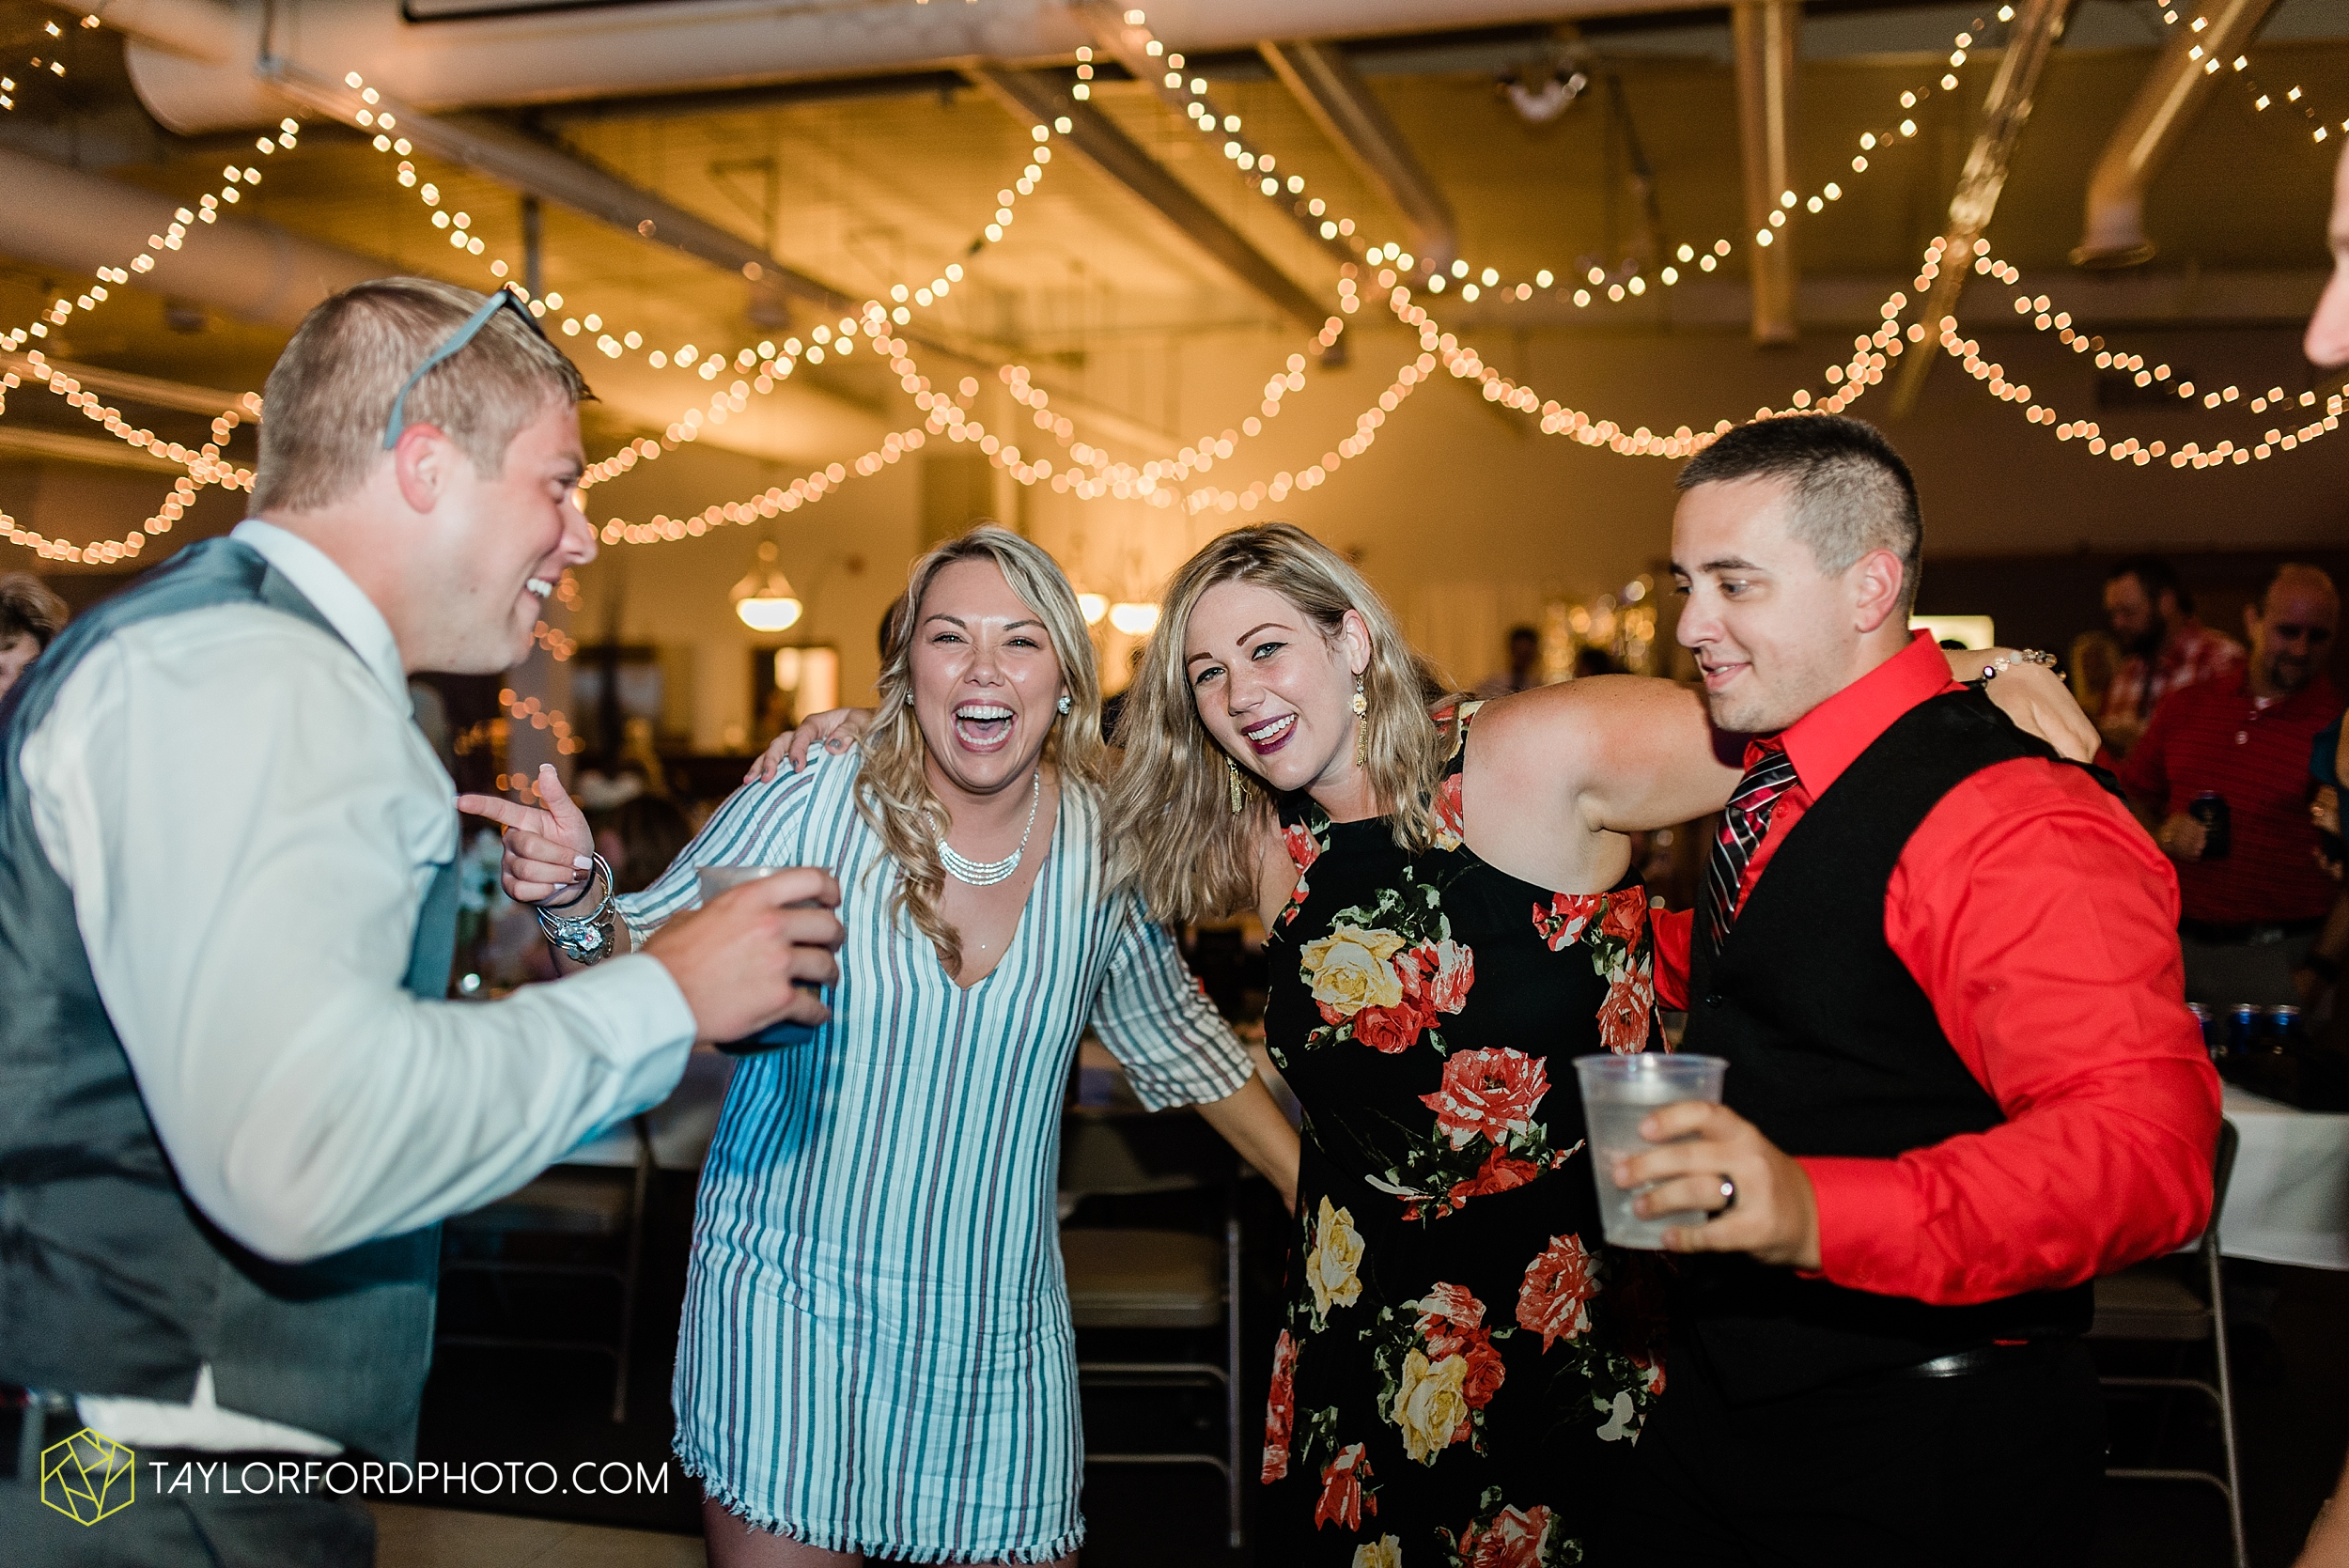 chelsey-zosh-jackson-young-first-united-methodist-church-senior-center-van-wert-ohio-wedding-photographer-taylor-ford-photography_0106.jpg